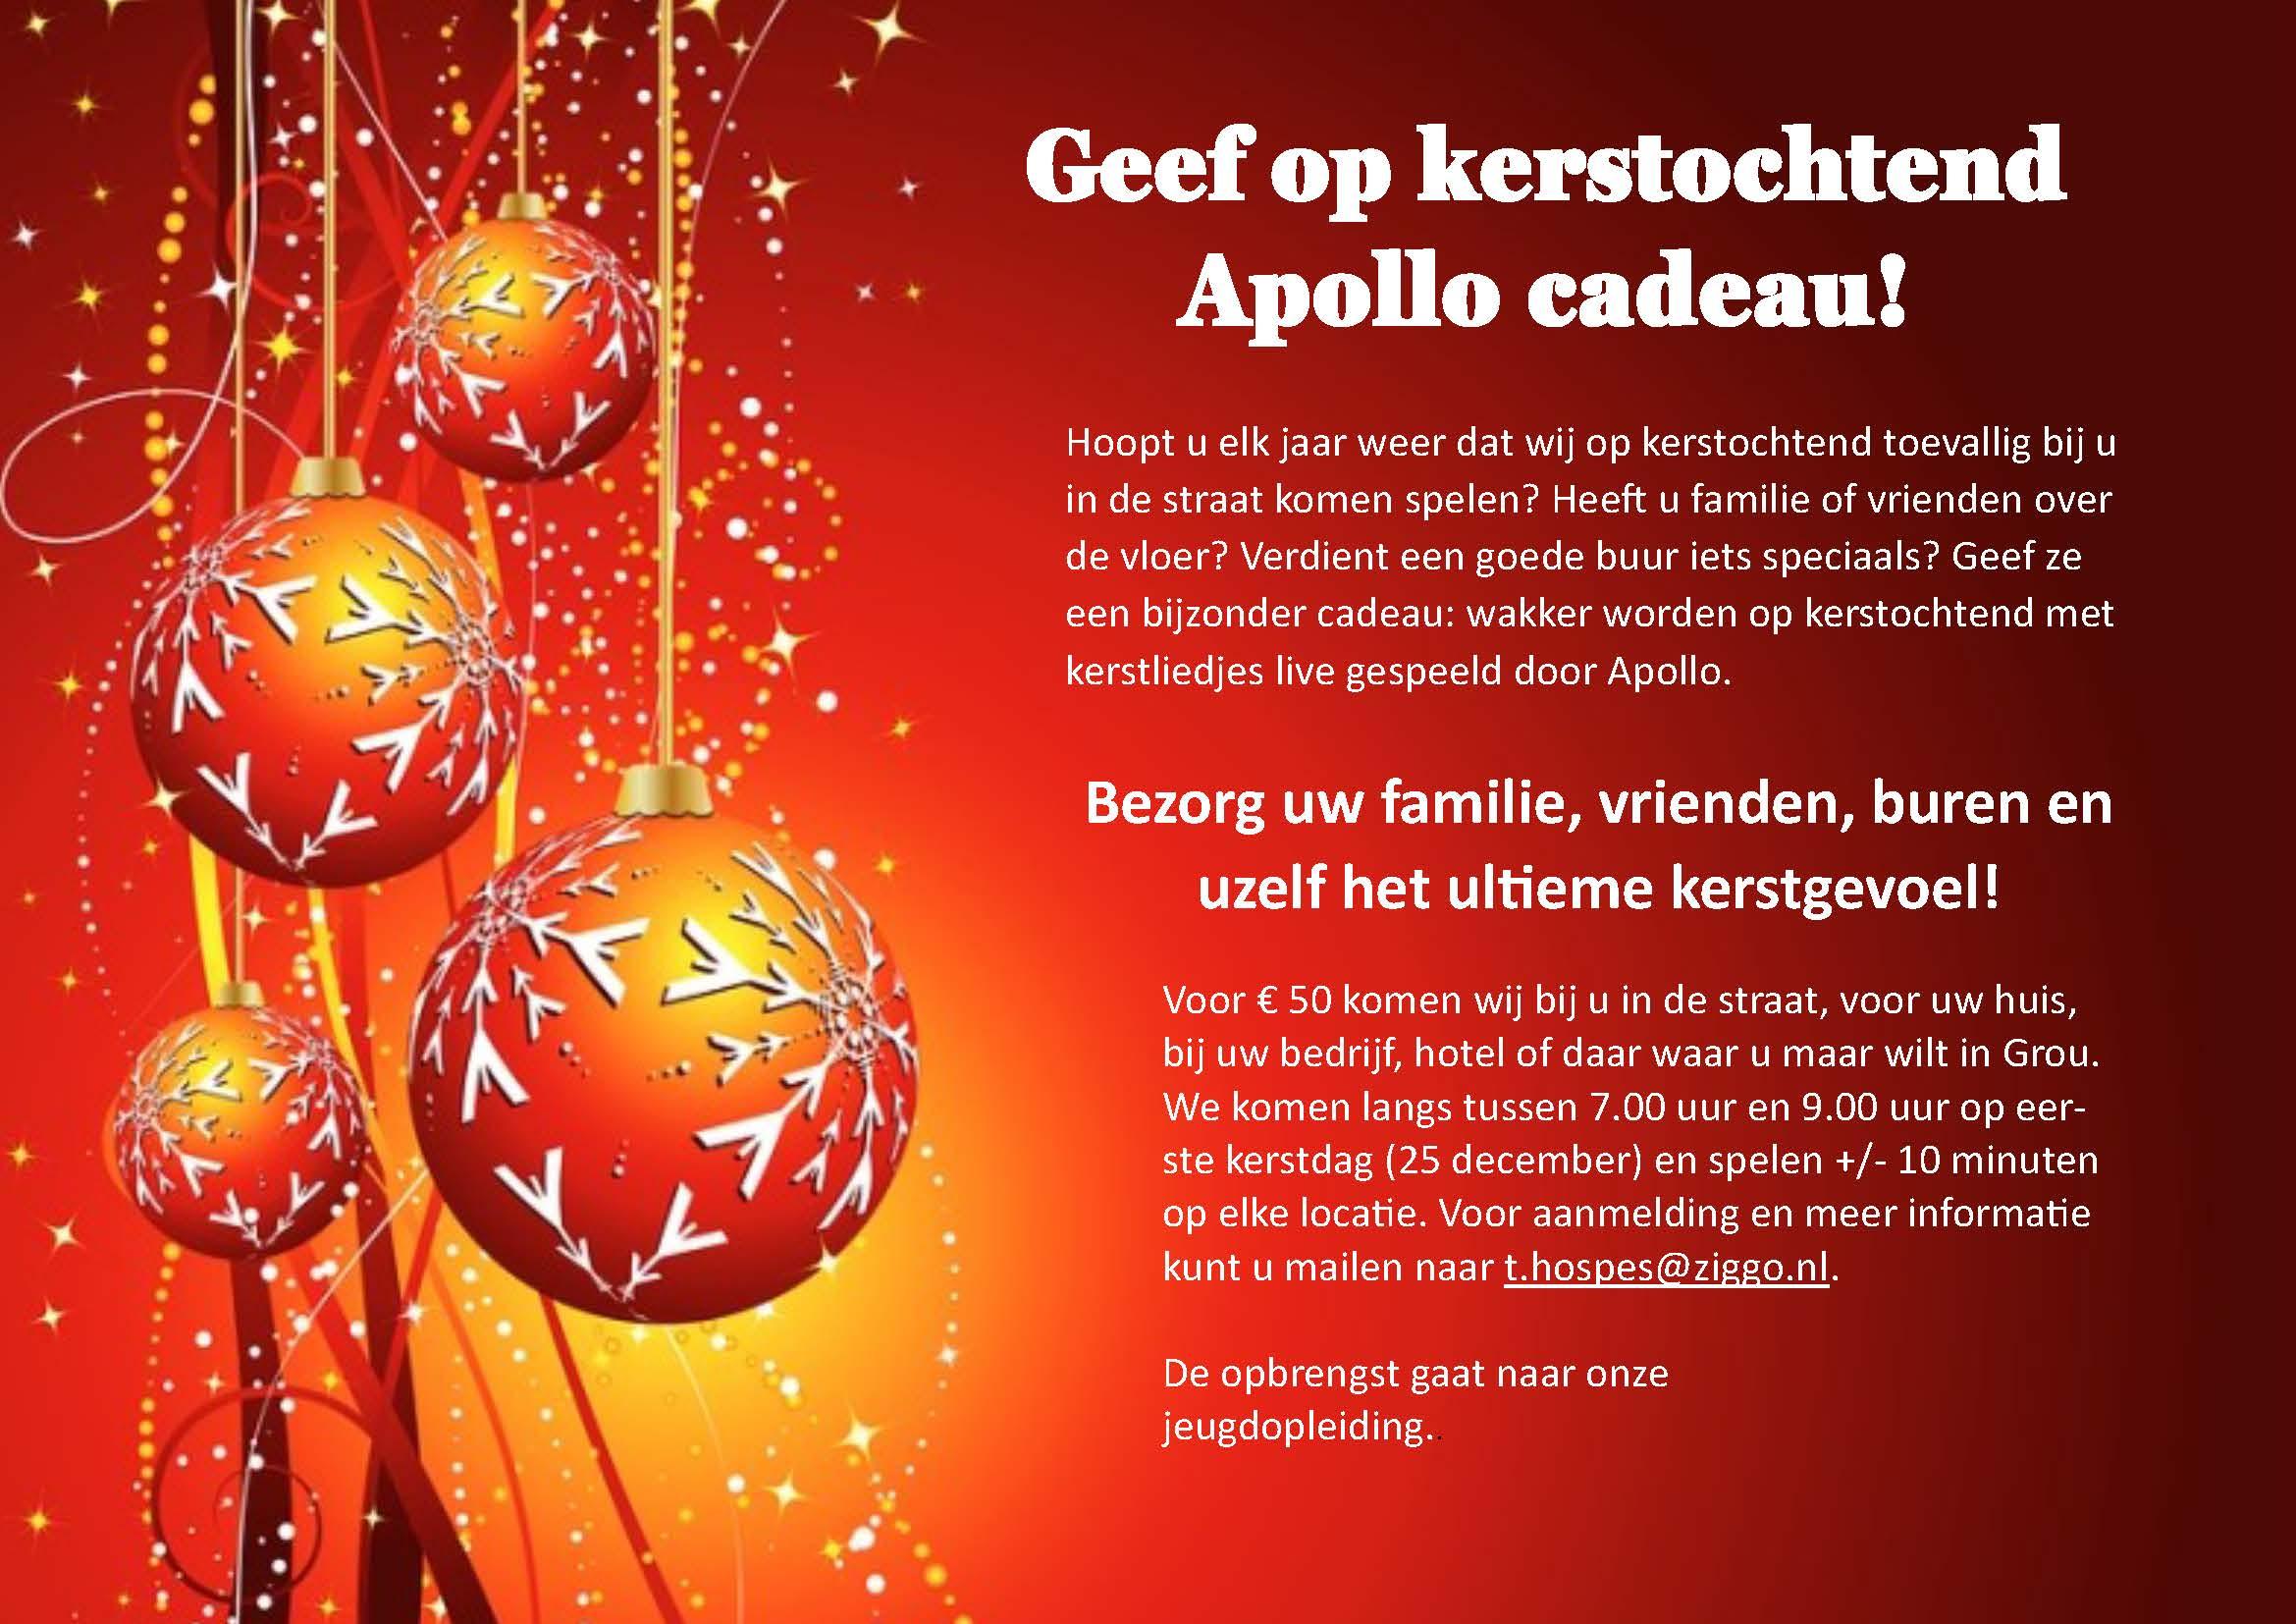 Geef op kerstochtend Apollo cadeau!